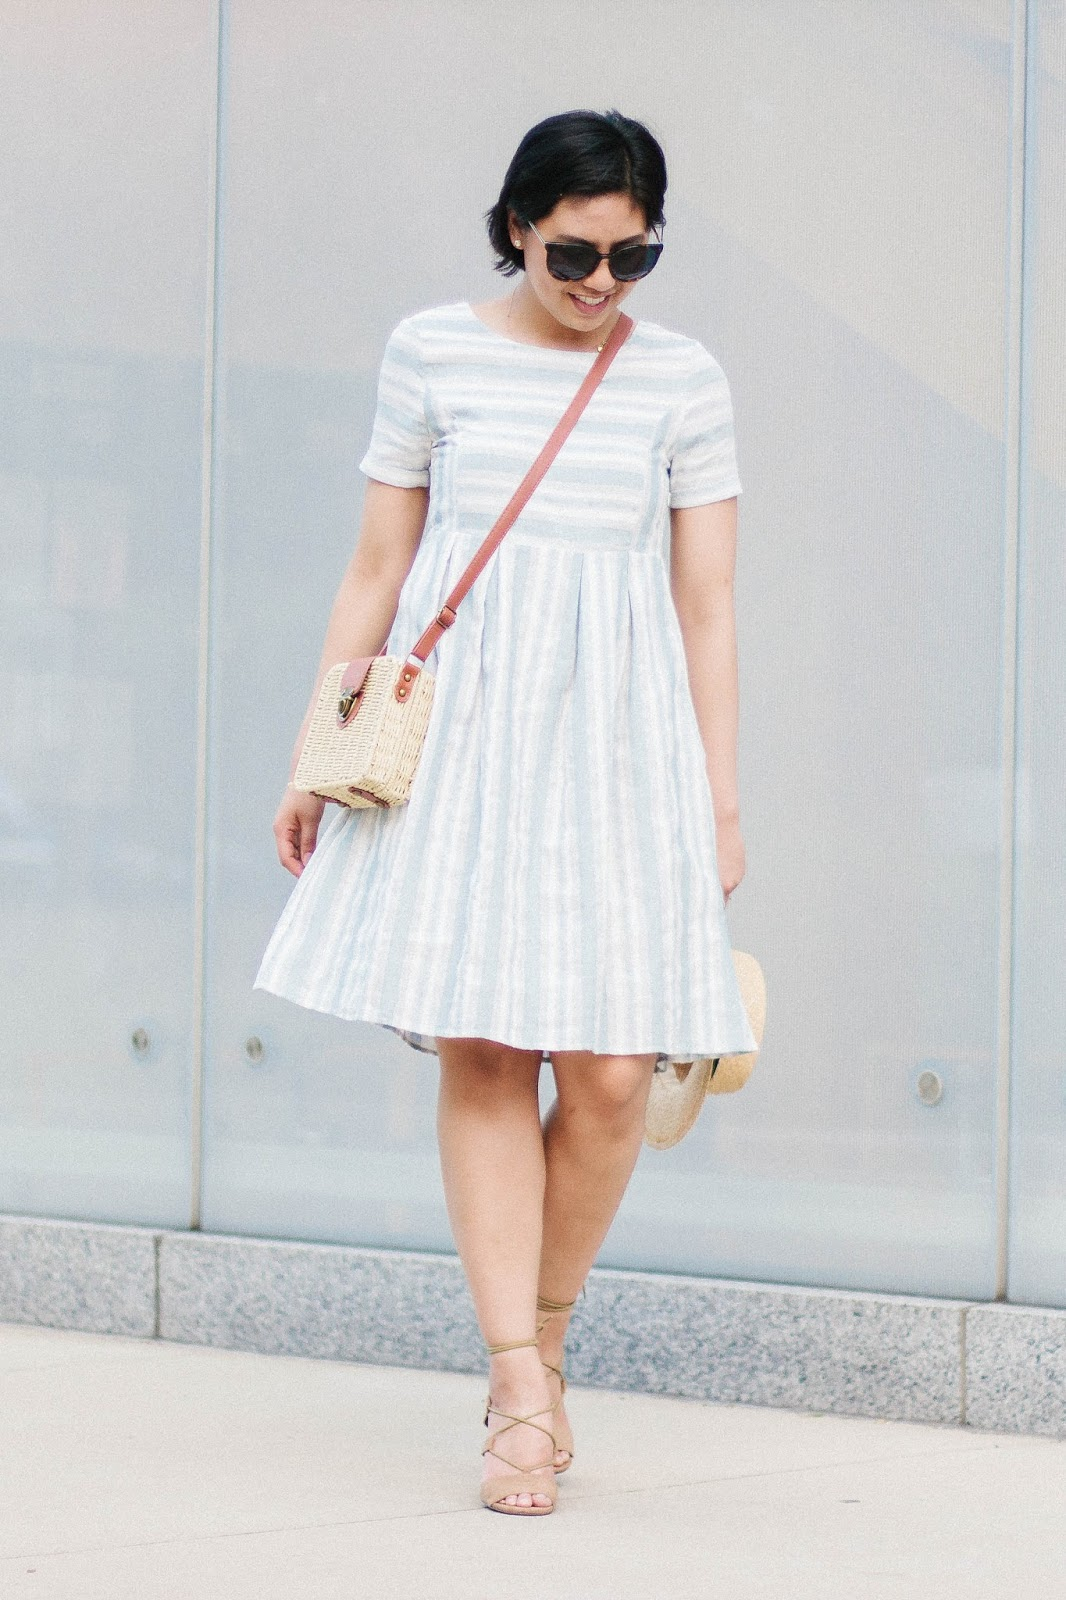 Striped Midi Dress for the Summer. Versatile dress for the Summer.